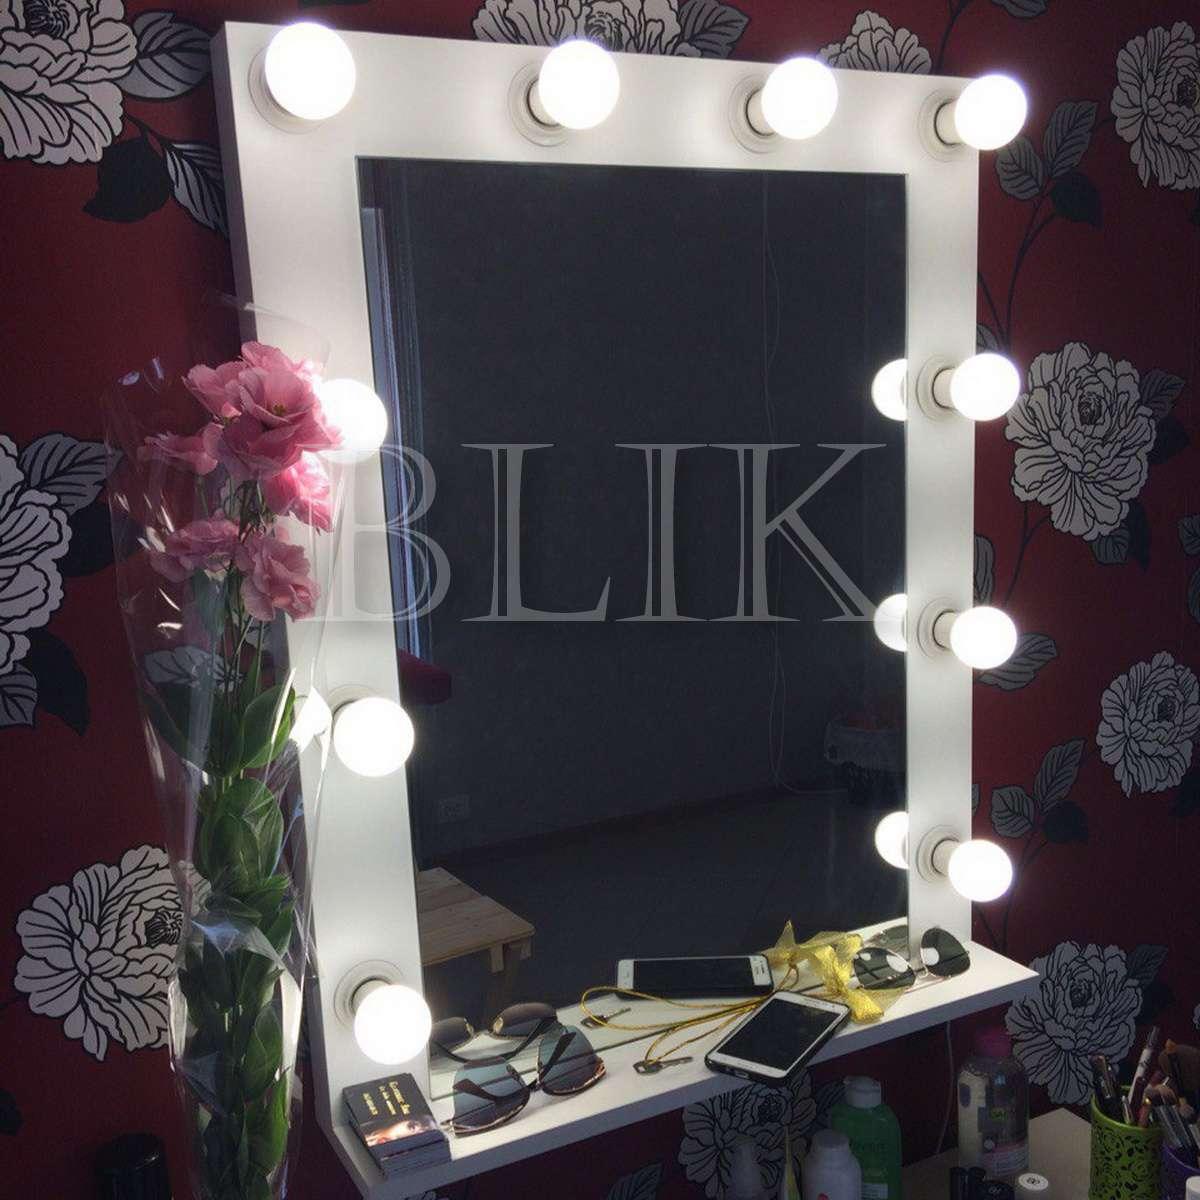 зеркало для макияжа (зеркало с лампочками)